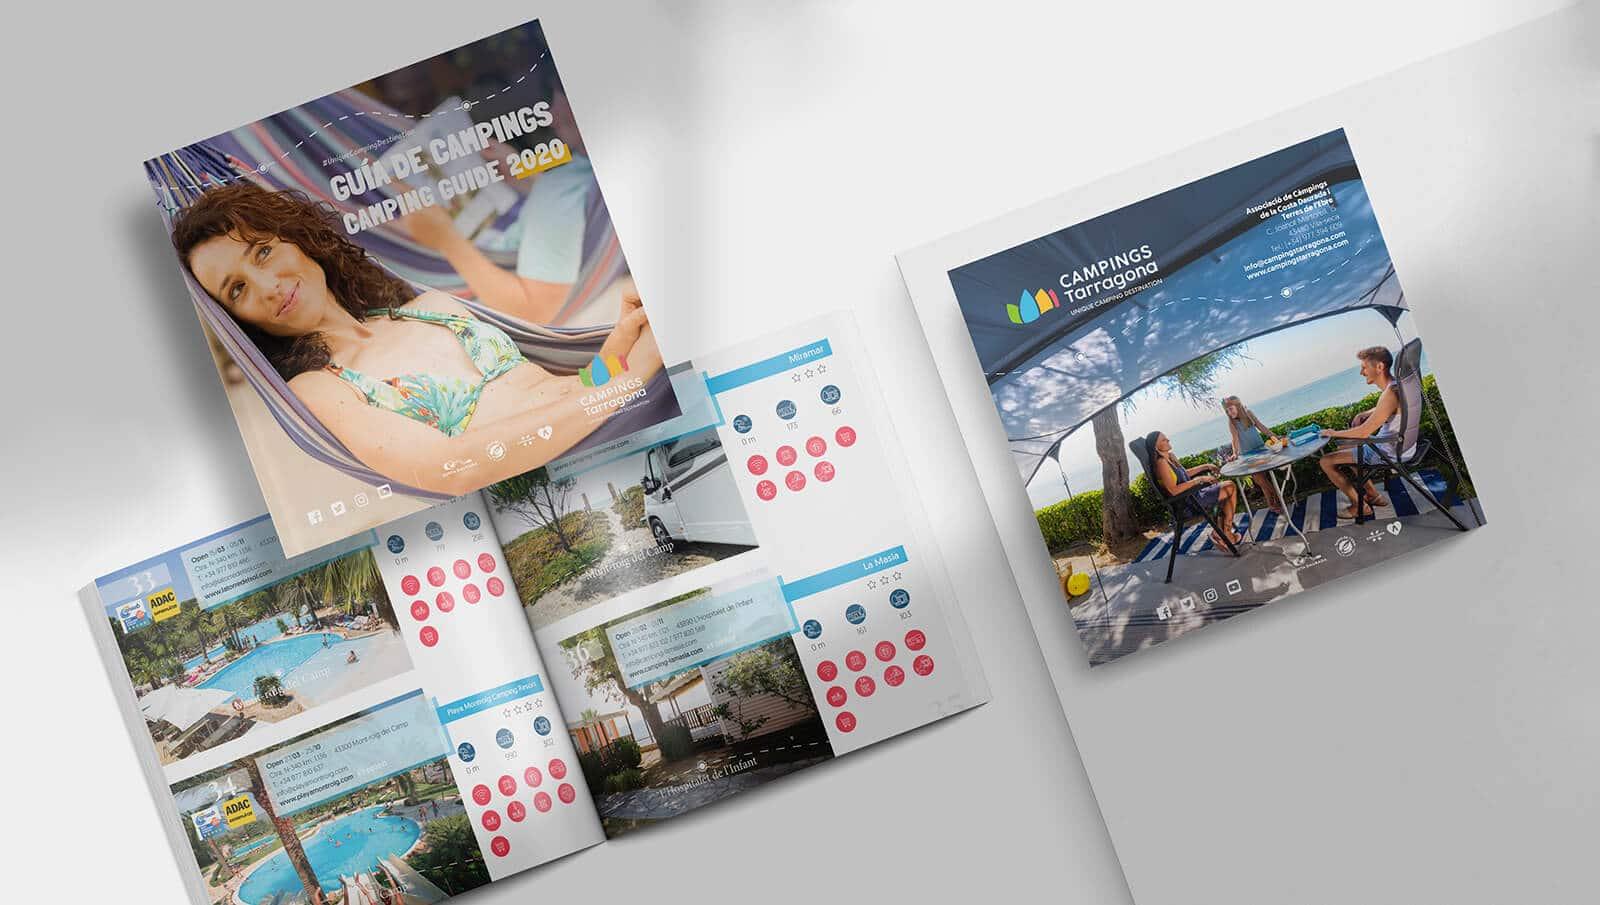 Diseño de maquinación de catálogo para Campings Tarragona